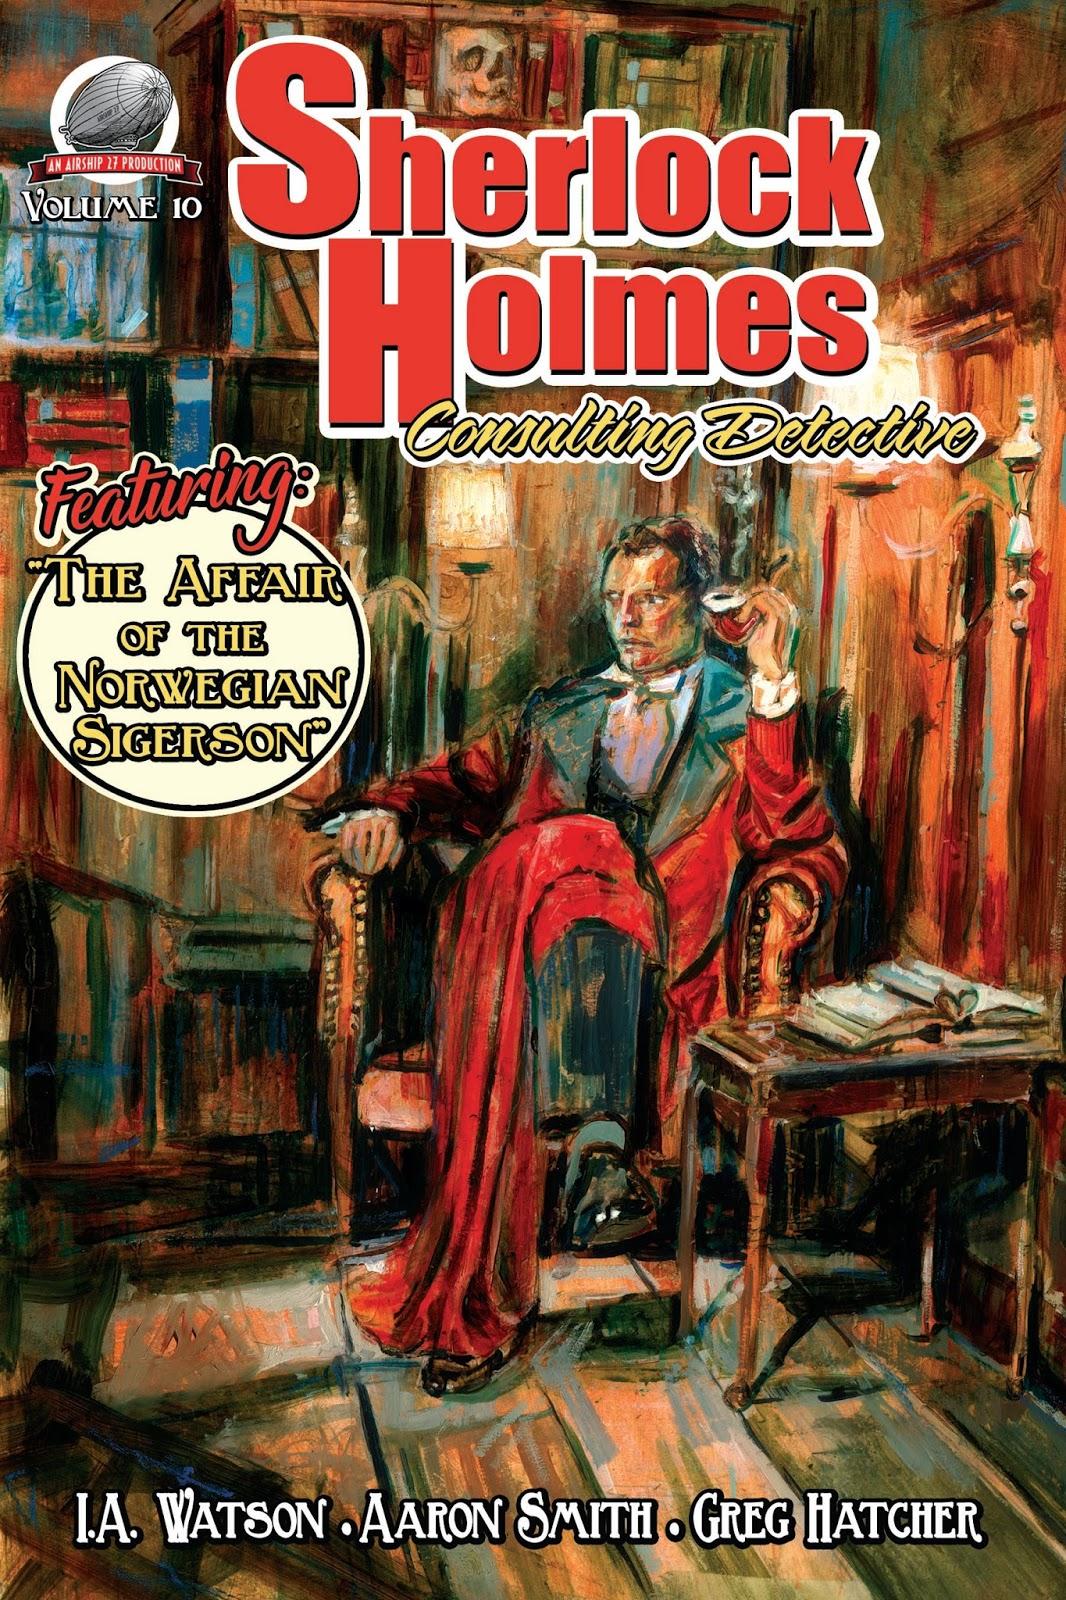 SHERLOCK HOLMES - Consulting Detective Vol 10